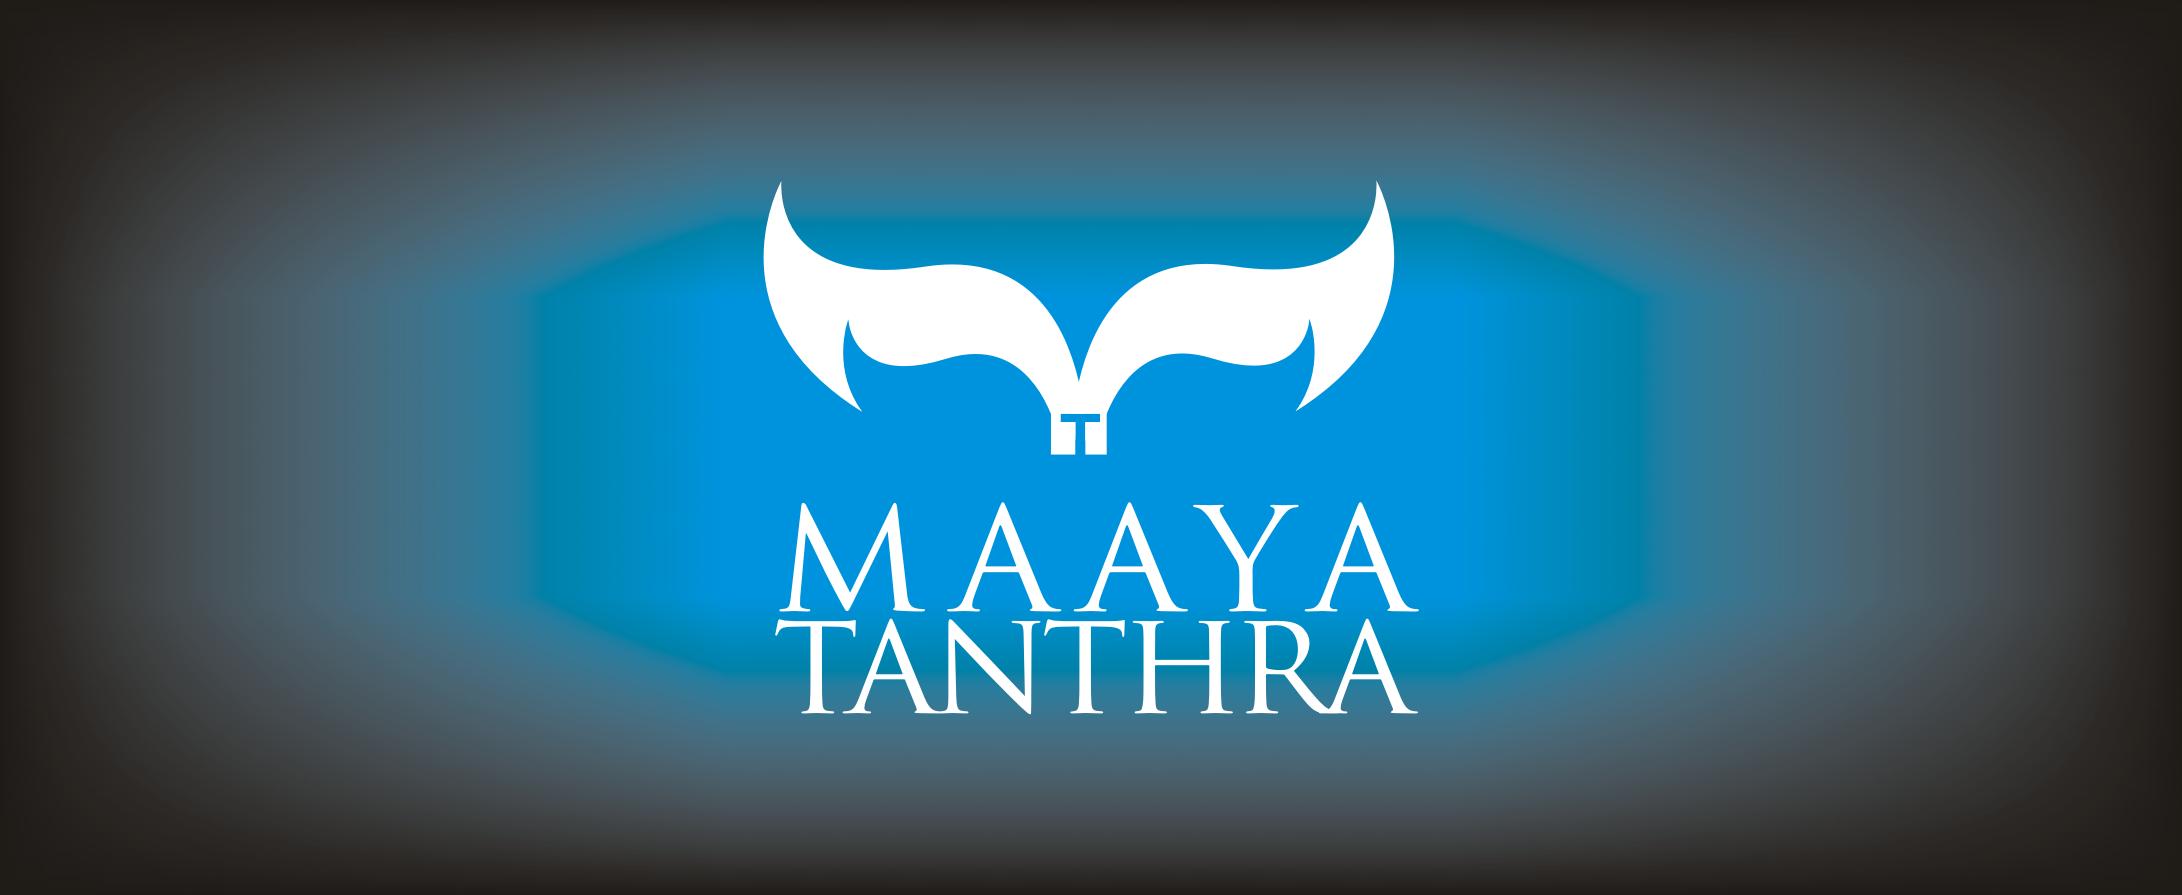 Maayatanthra